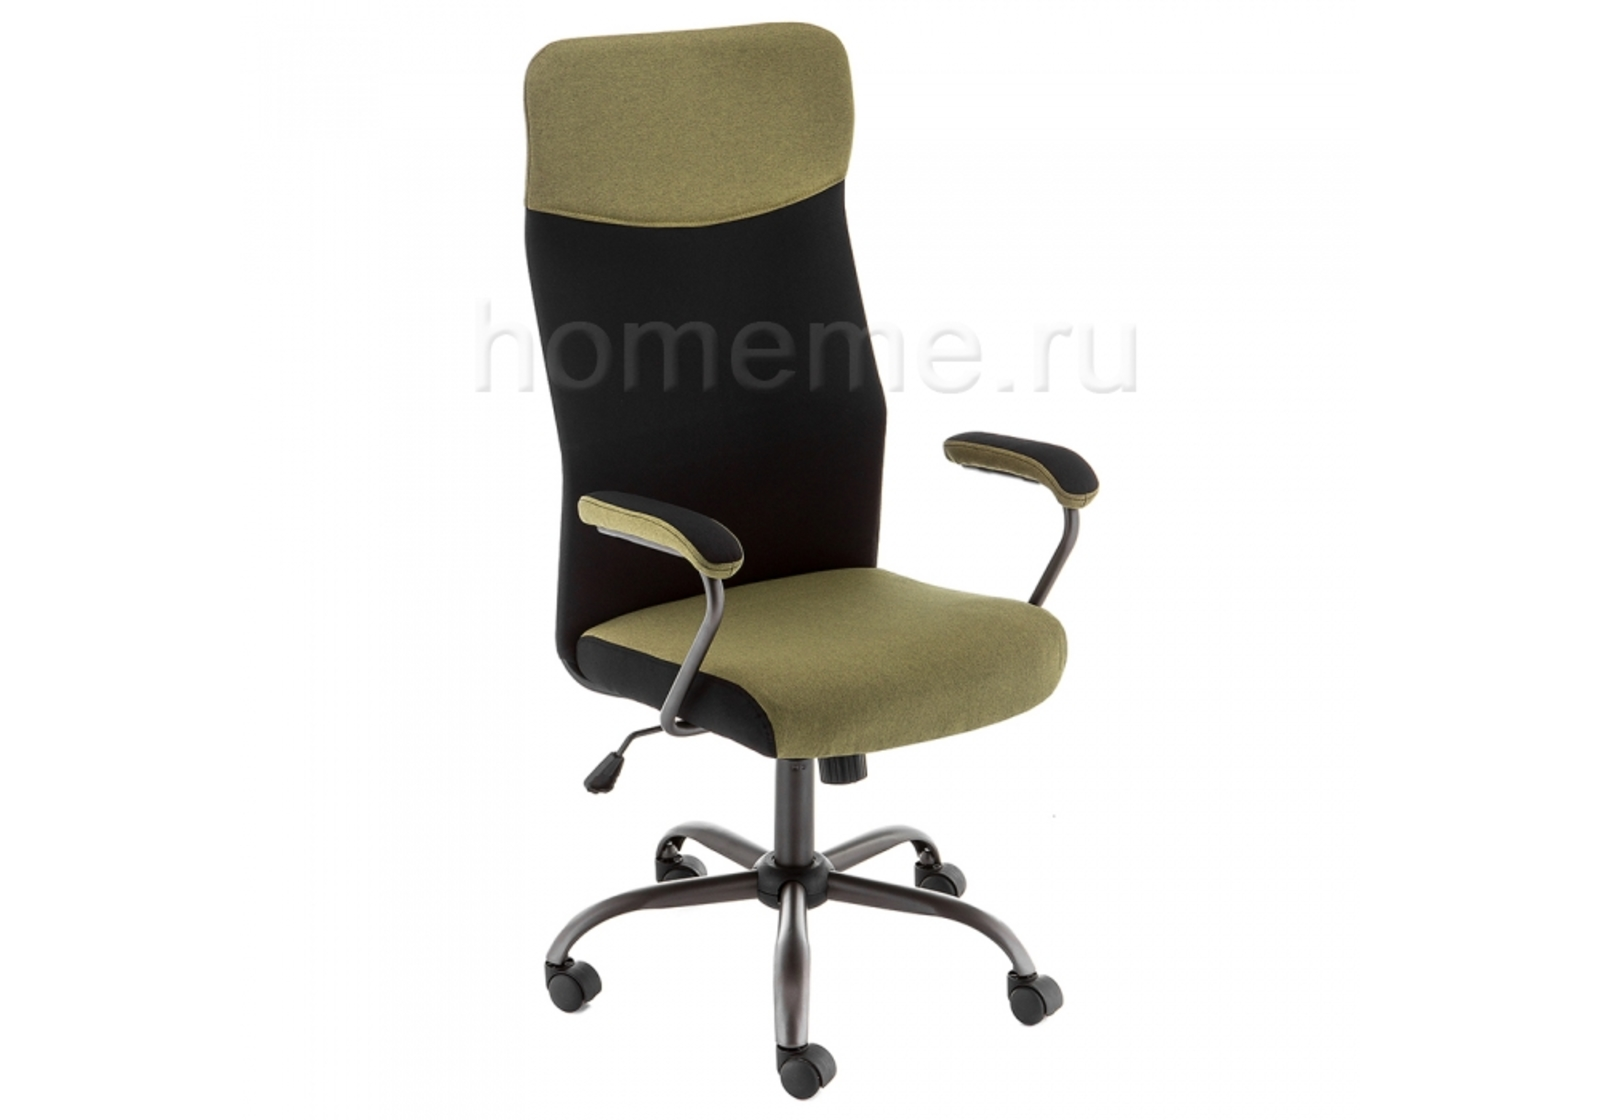 Кресло для офиса HomeMe Aven зеленое / черное 11276 от Homeme.ru